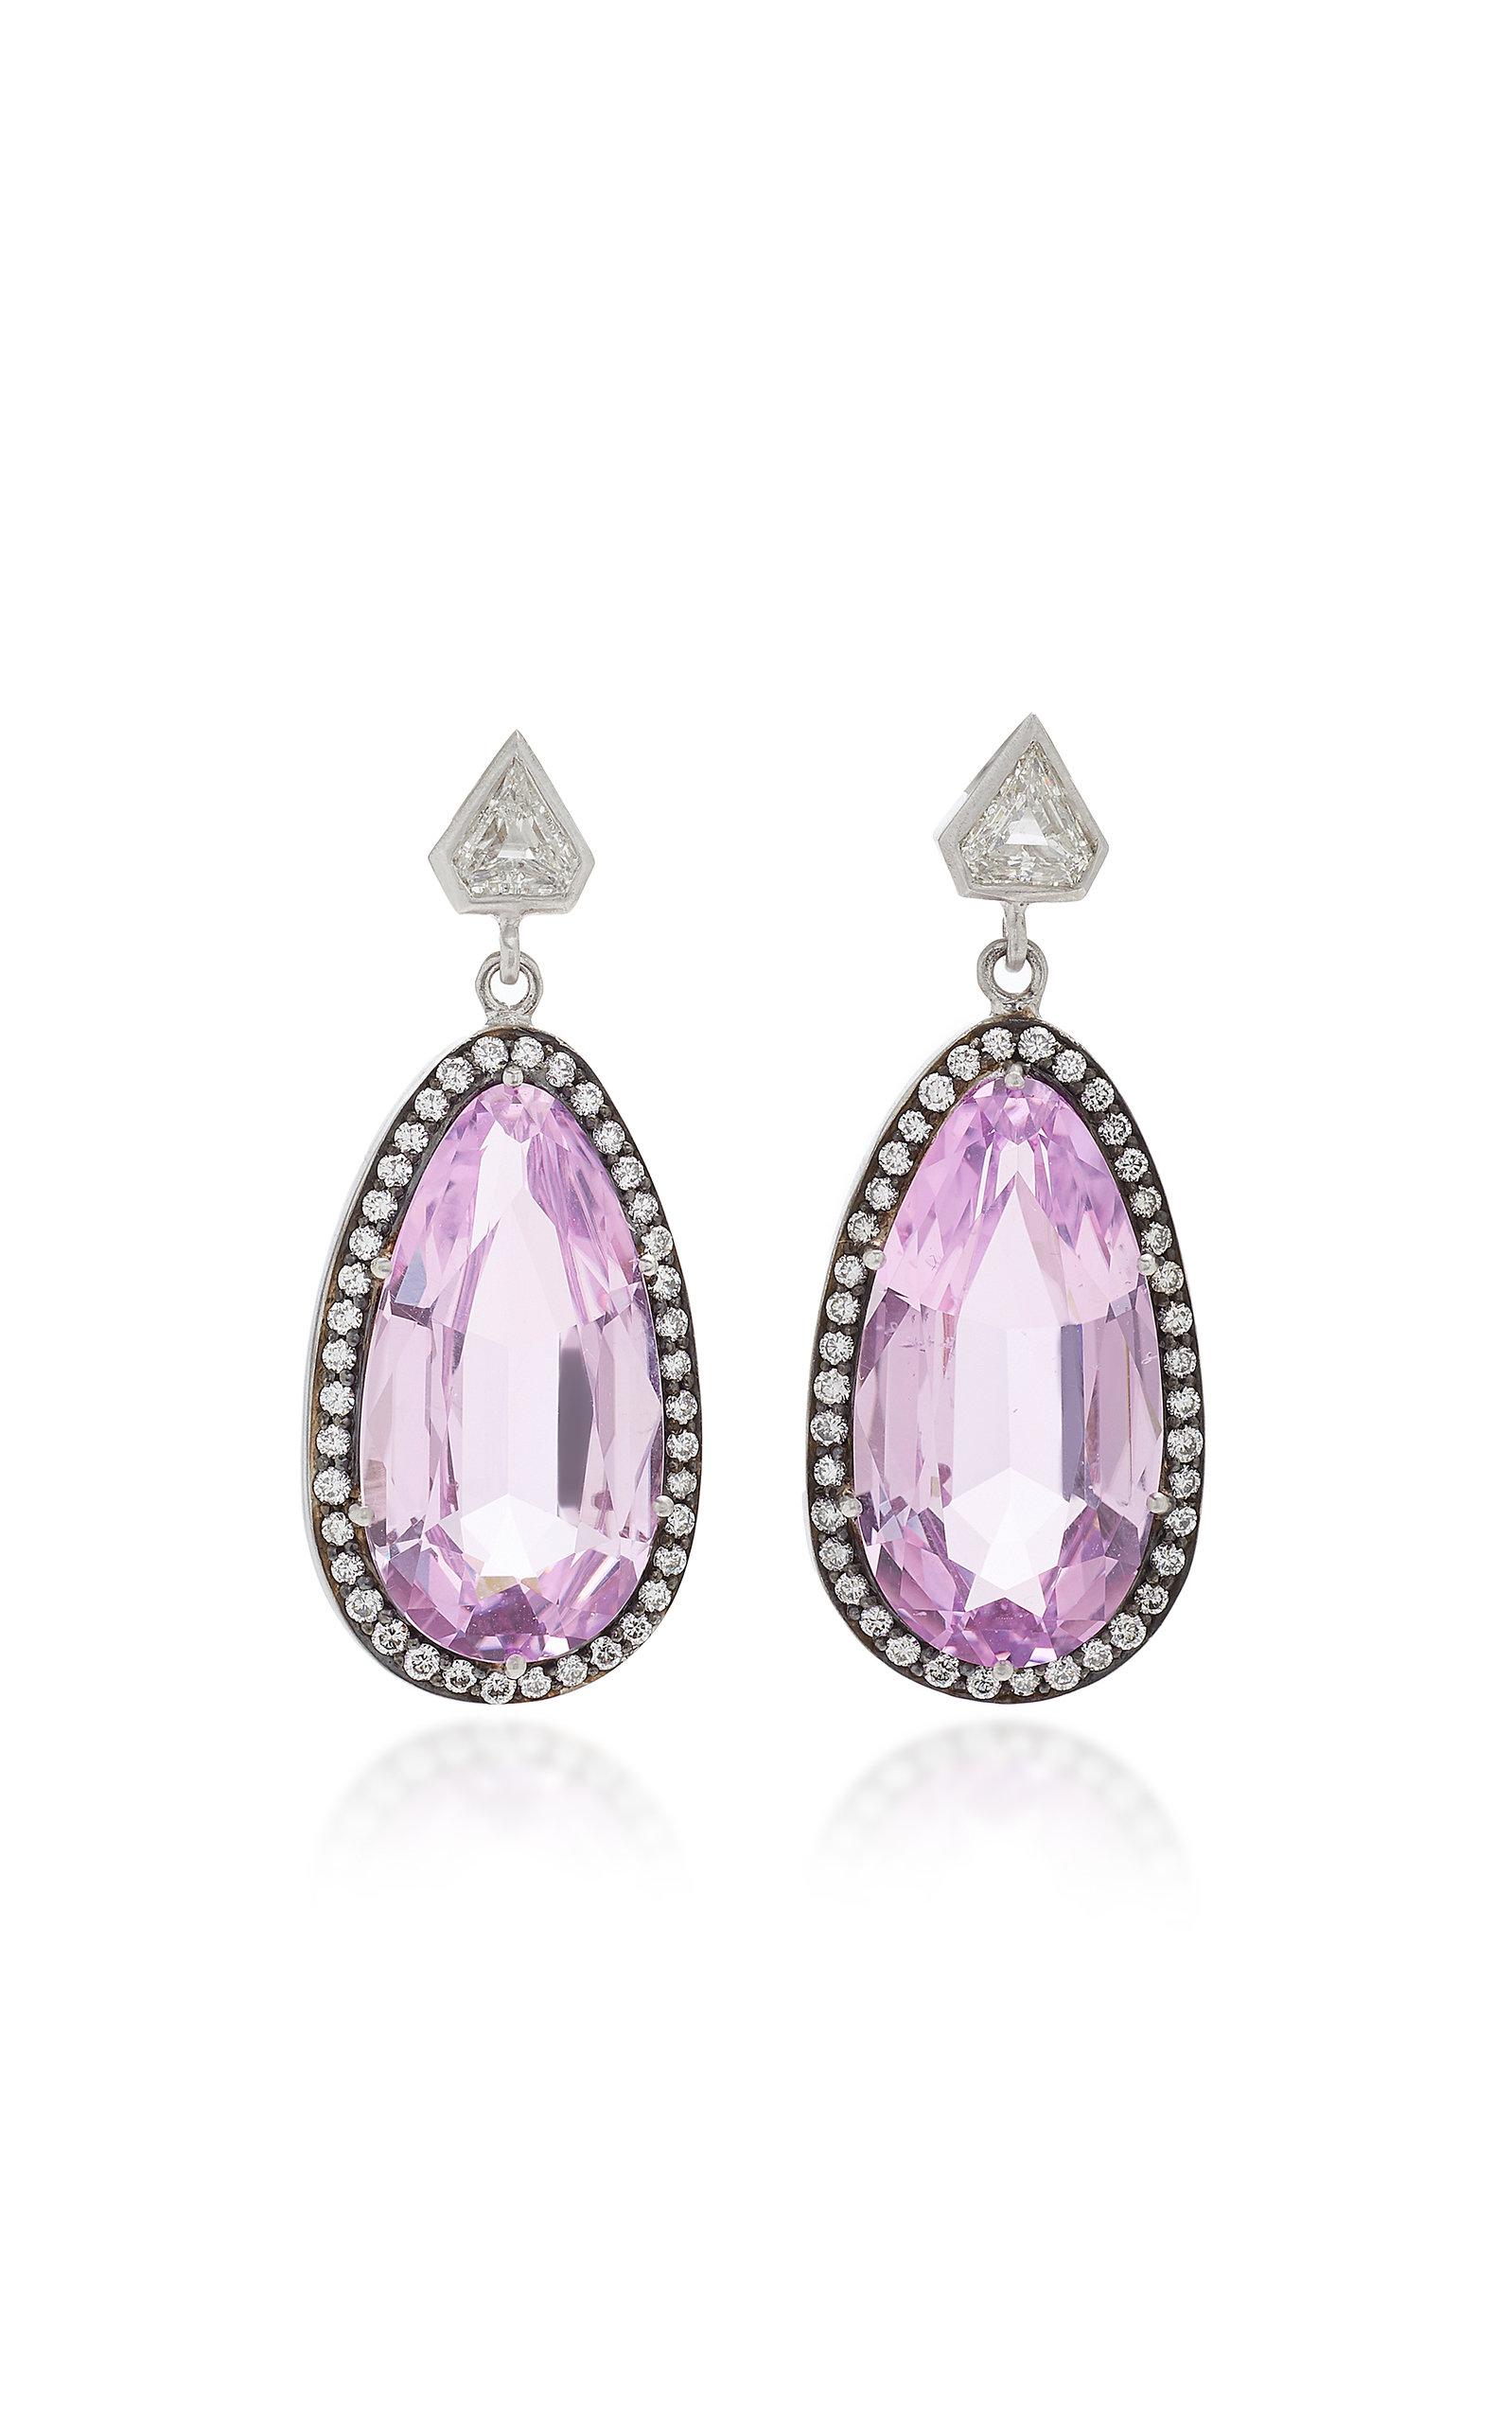 SYLVA & CIE 18K White Gold Kunzite And Diamond Earrings in Purple